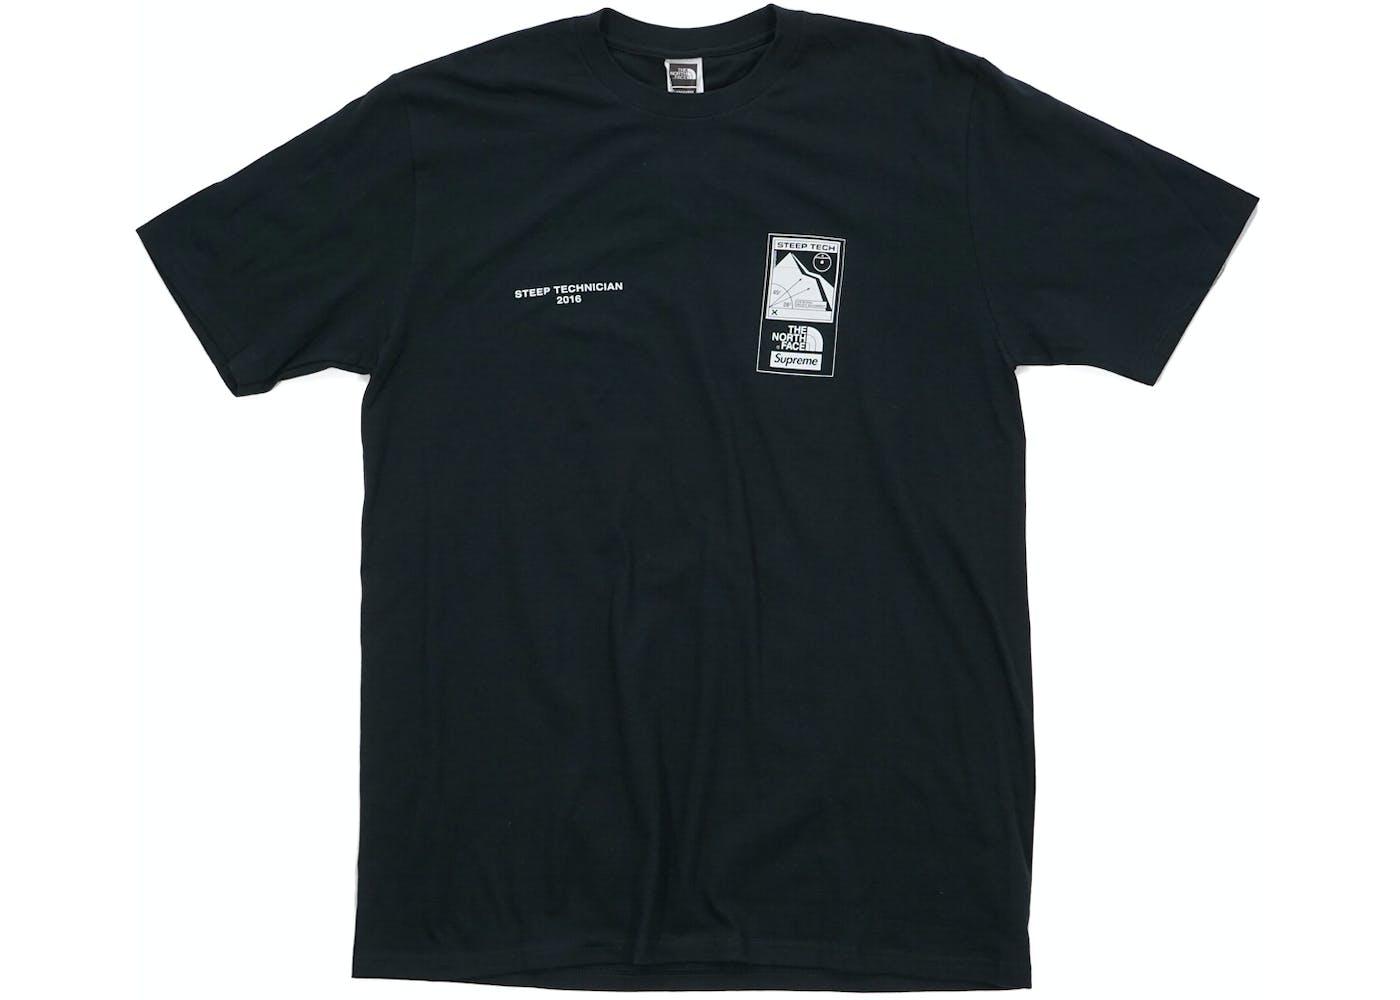 Black t shirt supreme - Supreme The North Face Steep Tech T Shirt Black